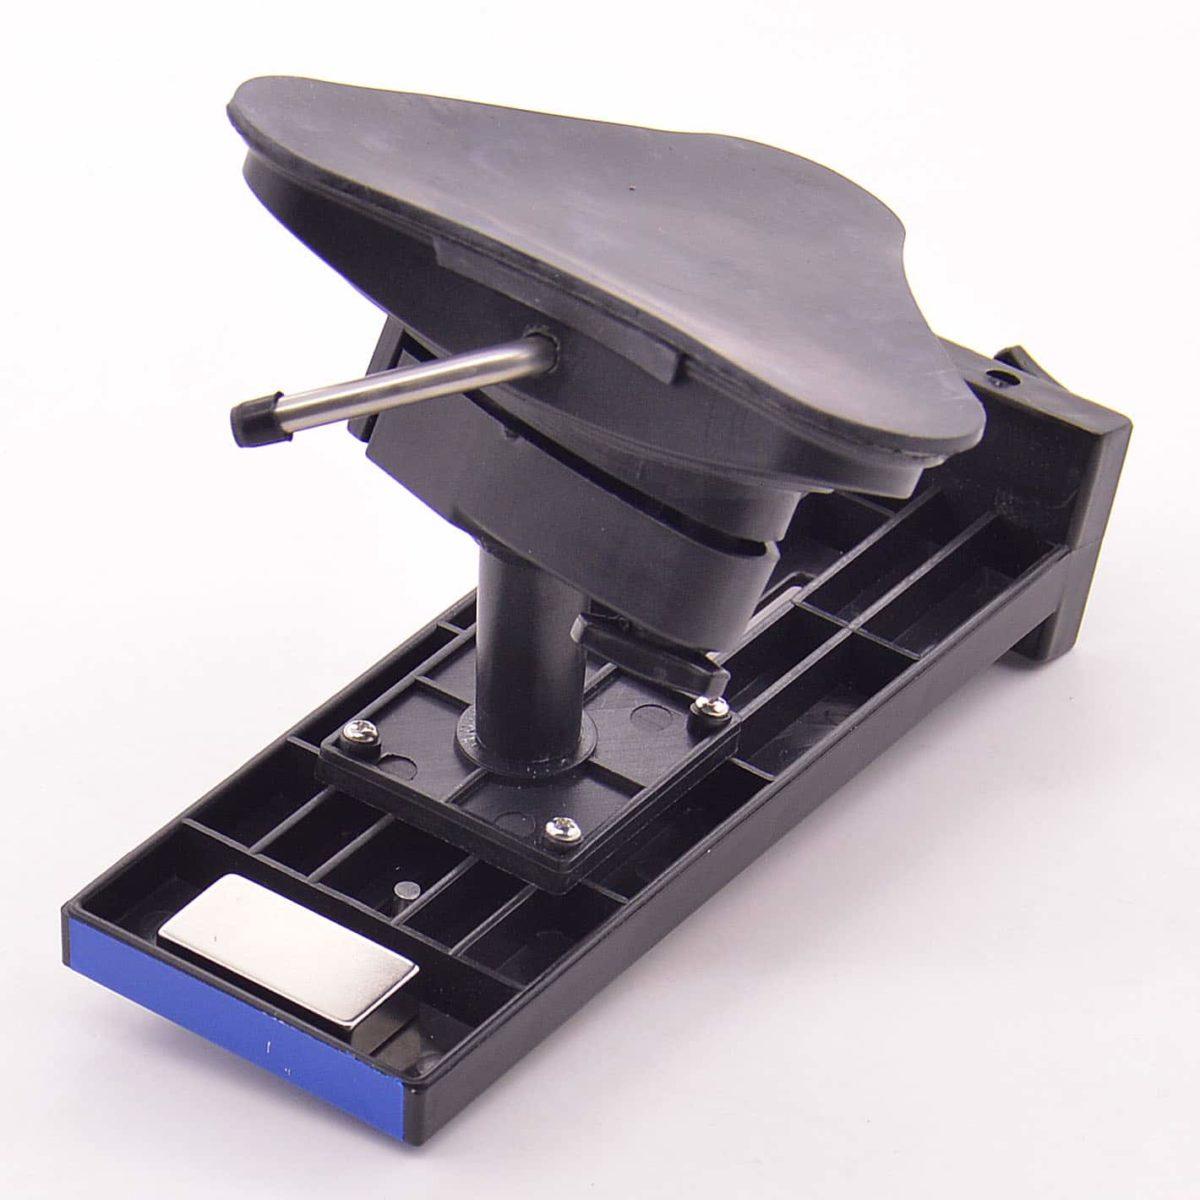 Неодимовый магнит 40х20х10мм для точилок Ruixin и Edge Pro Apex 2